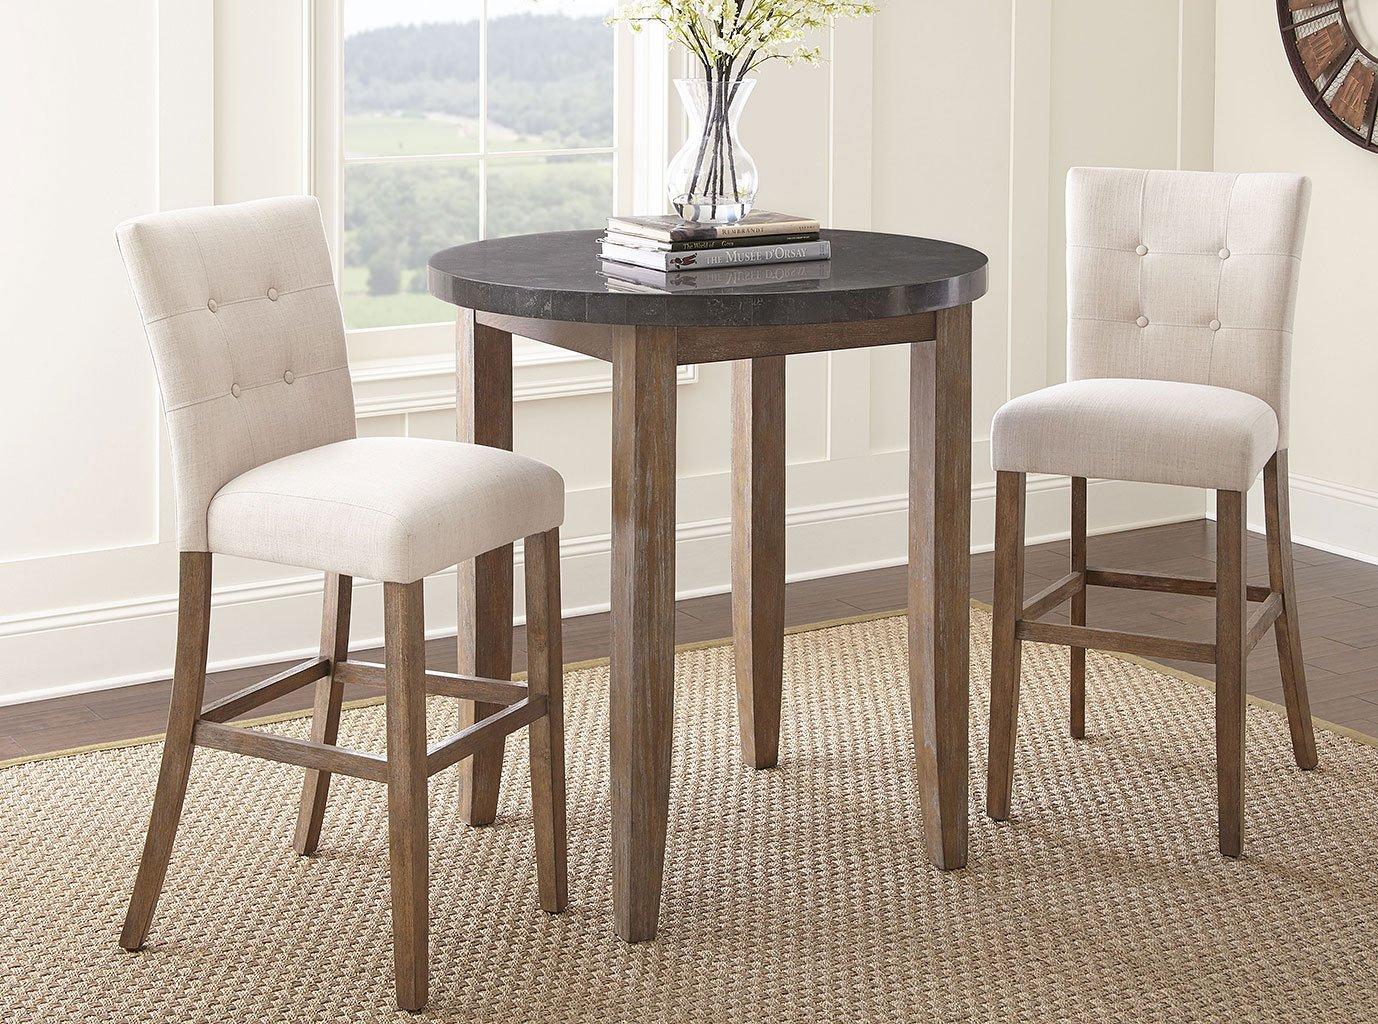 Debby Bar Table Set W/ Beige Chairs Steve Silver Furniture | Furniture Cart